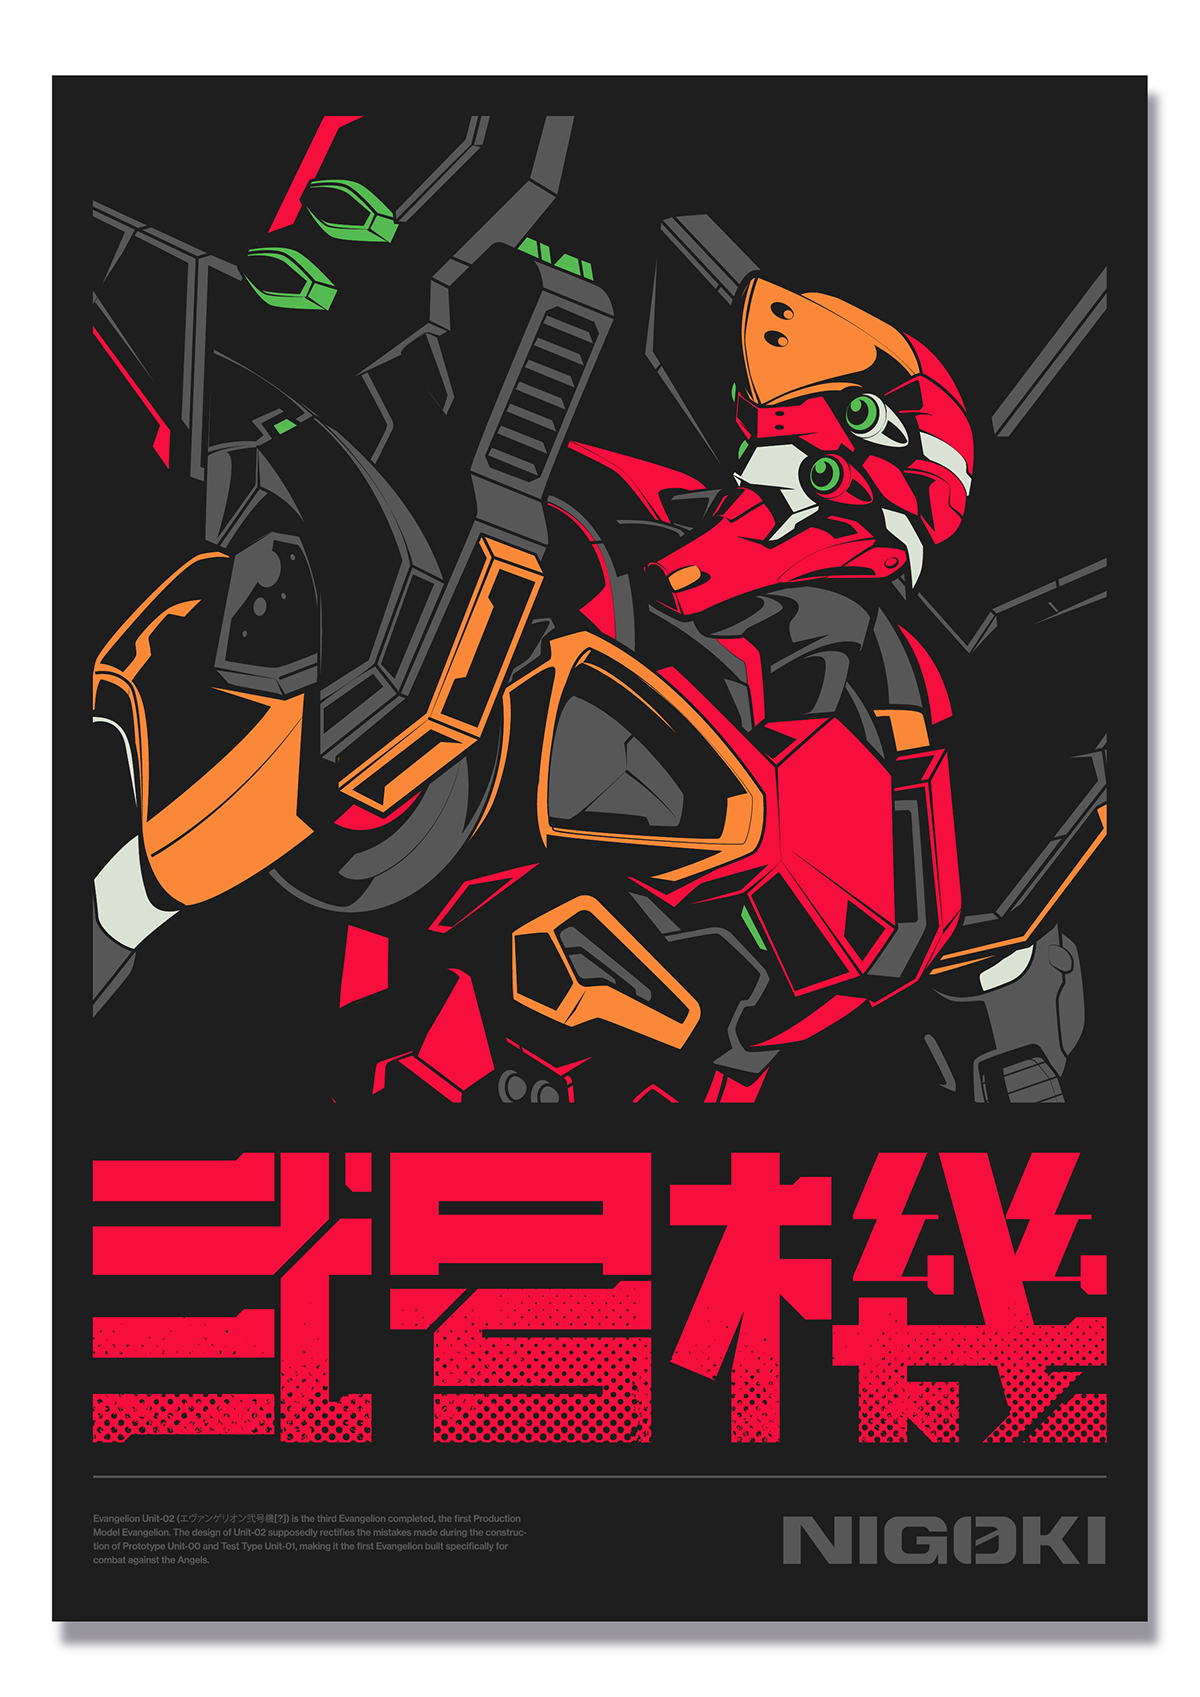 Gundam japanese mecha Retro